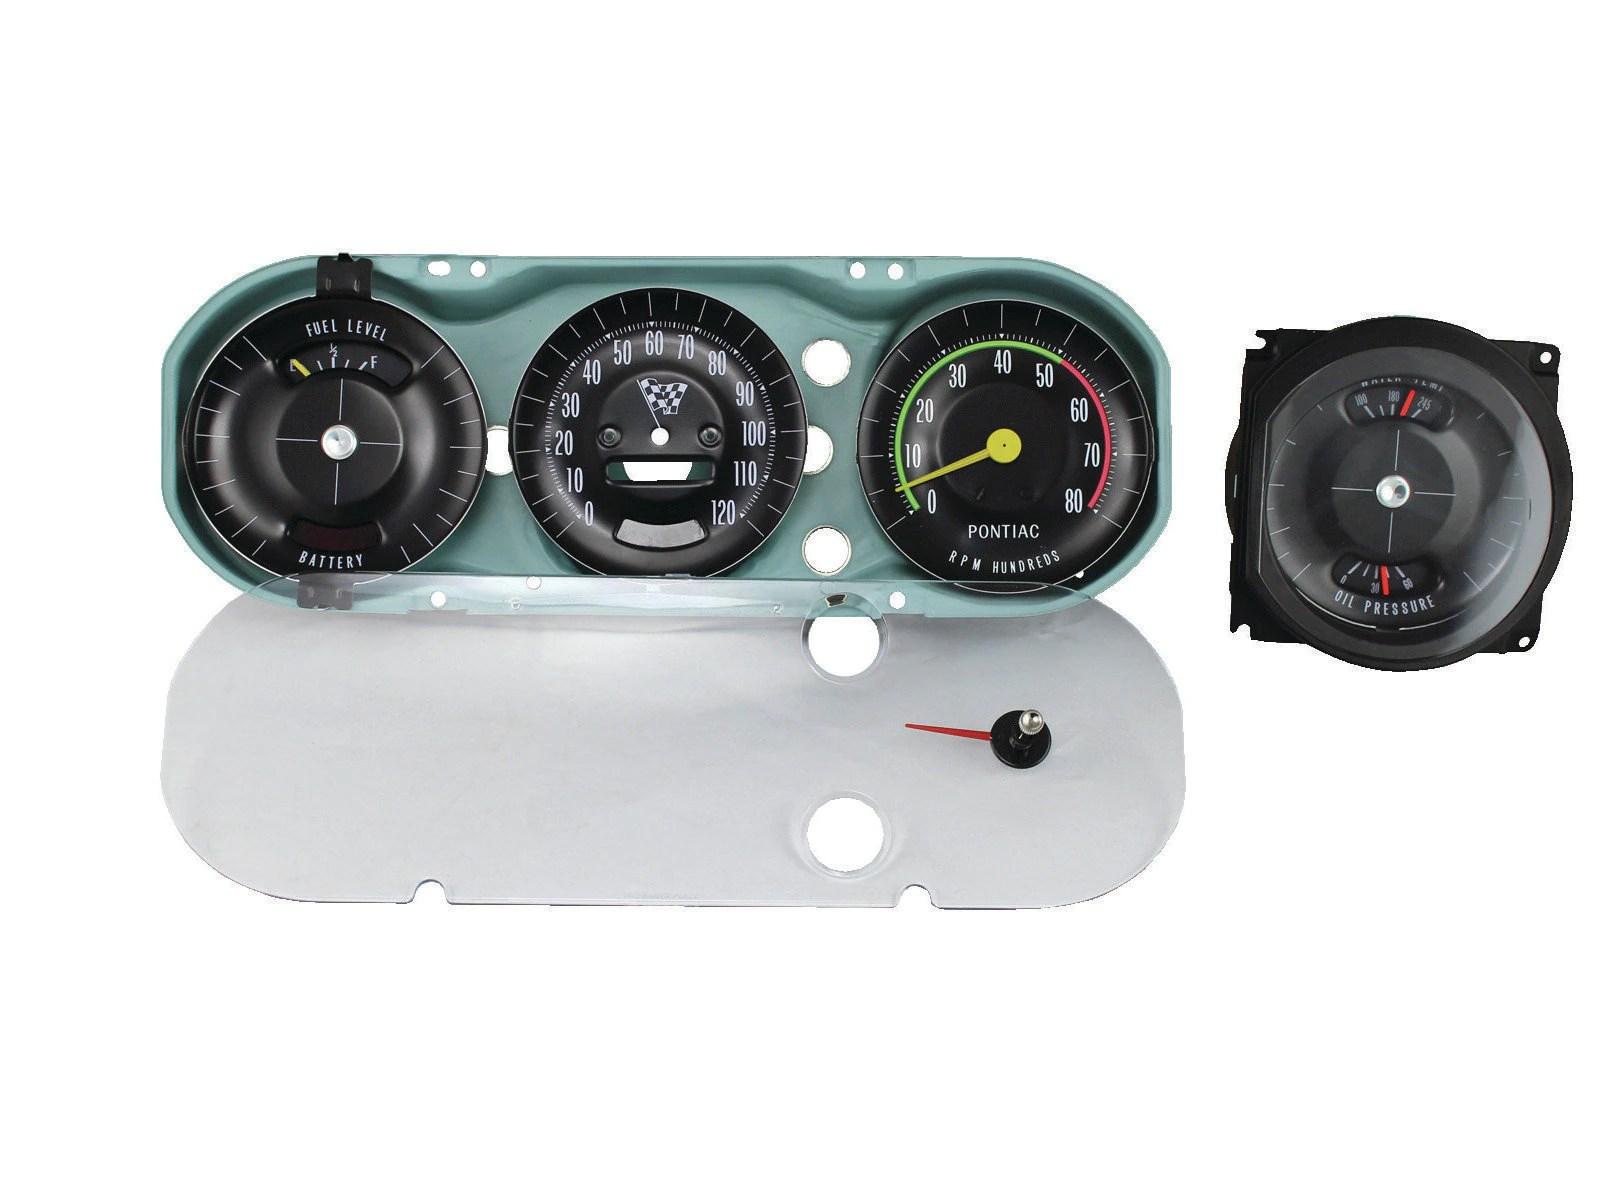 small resolution of 1965 pontiac gto rally gauge wiring diagram wiring library 1965 gto rally gauges wiring diagram